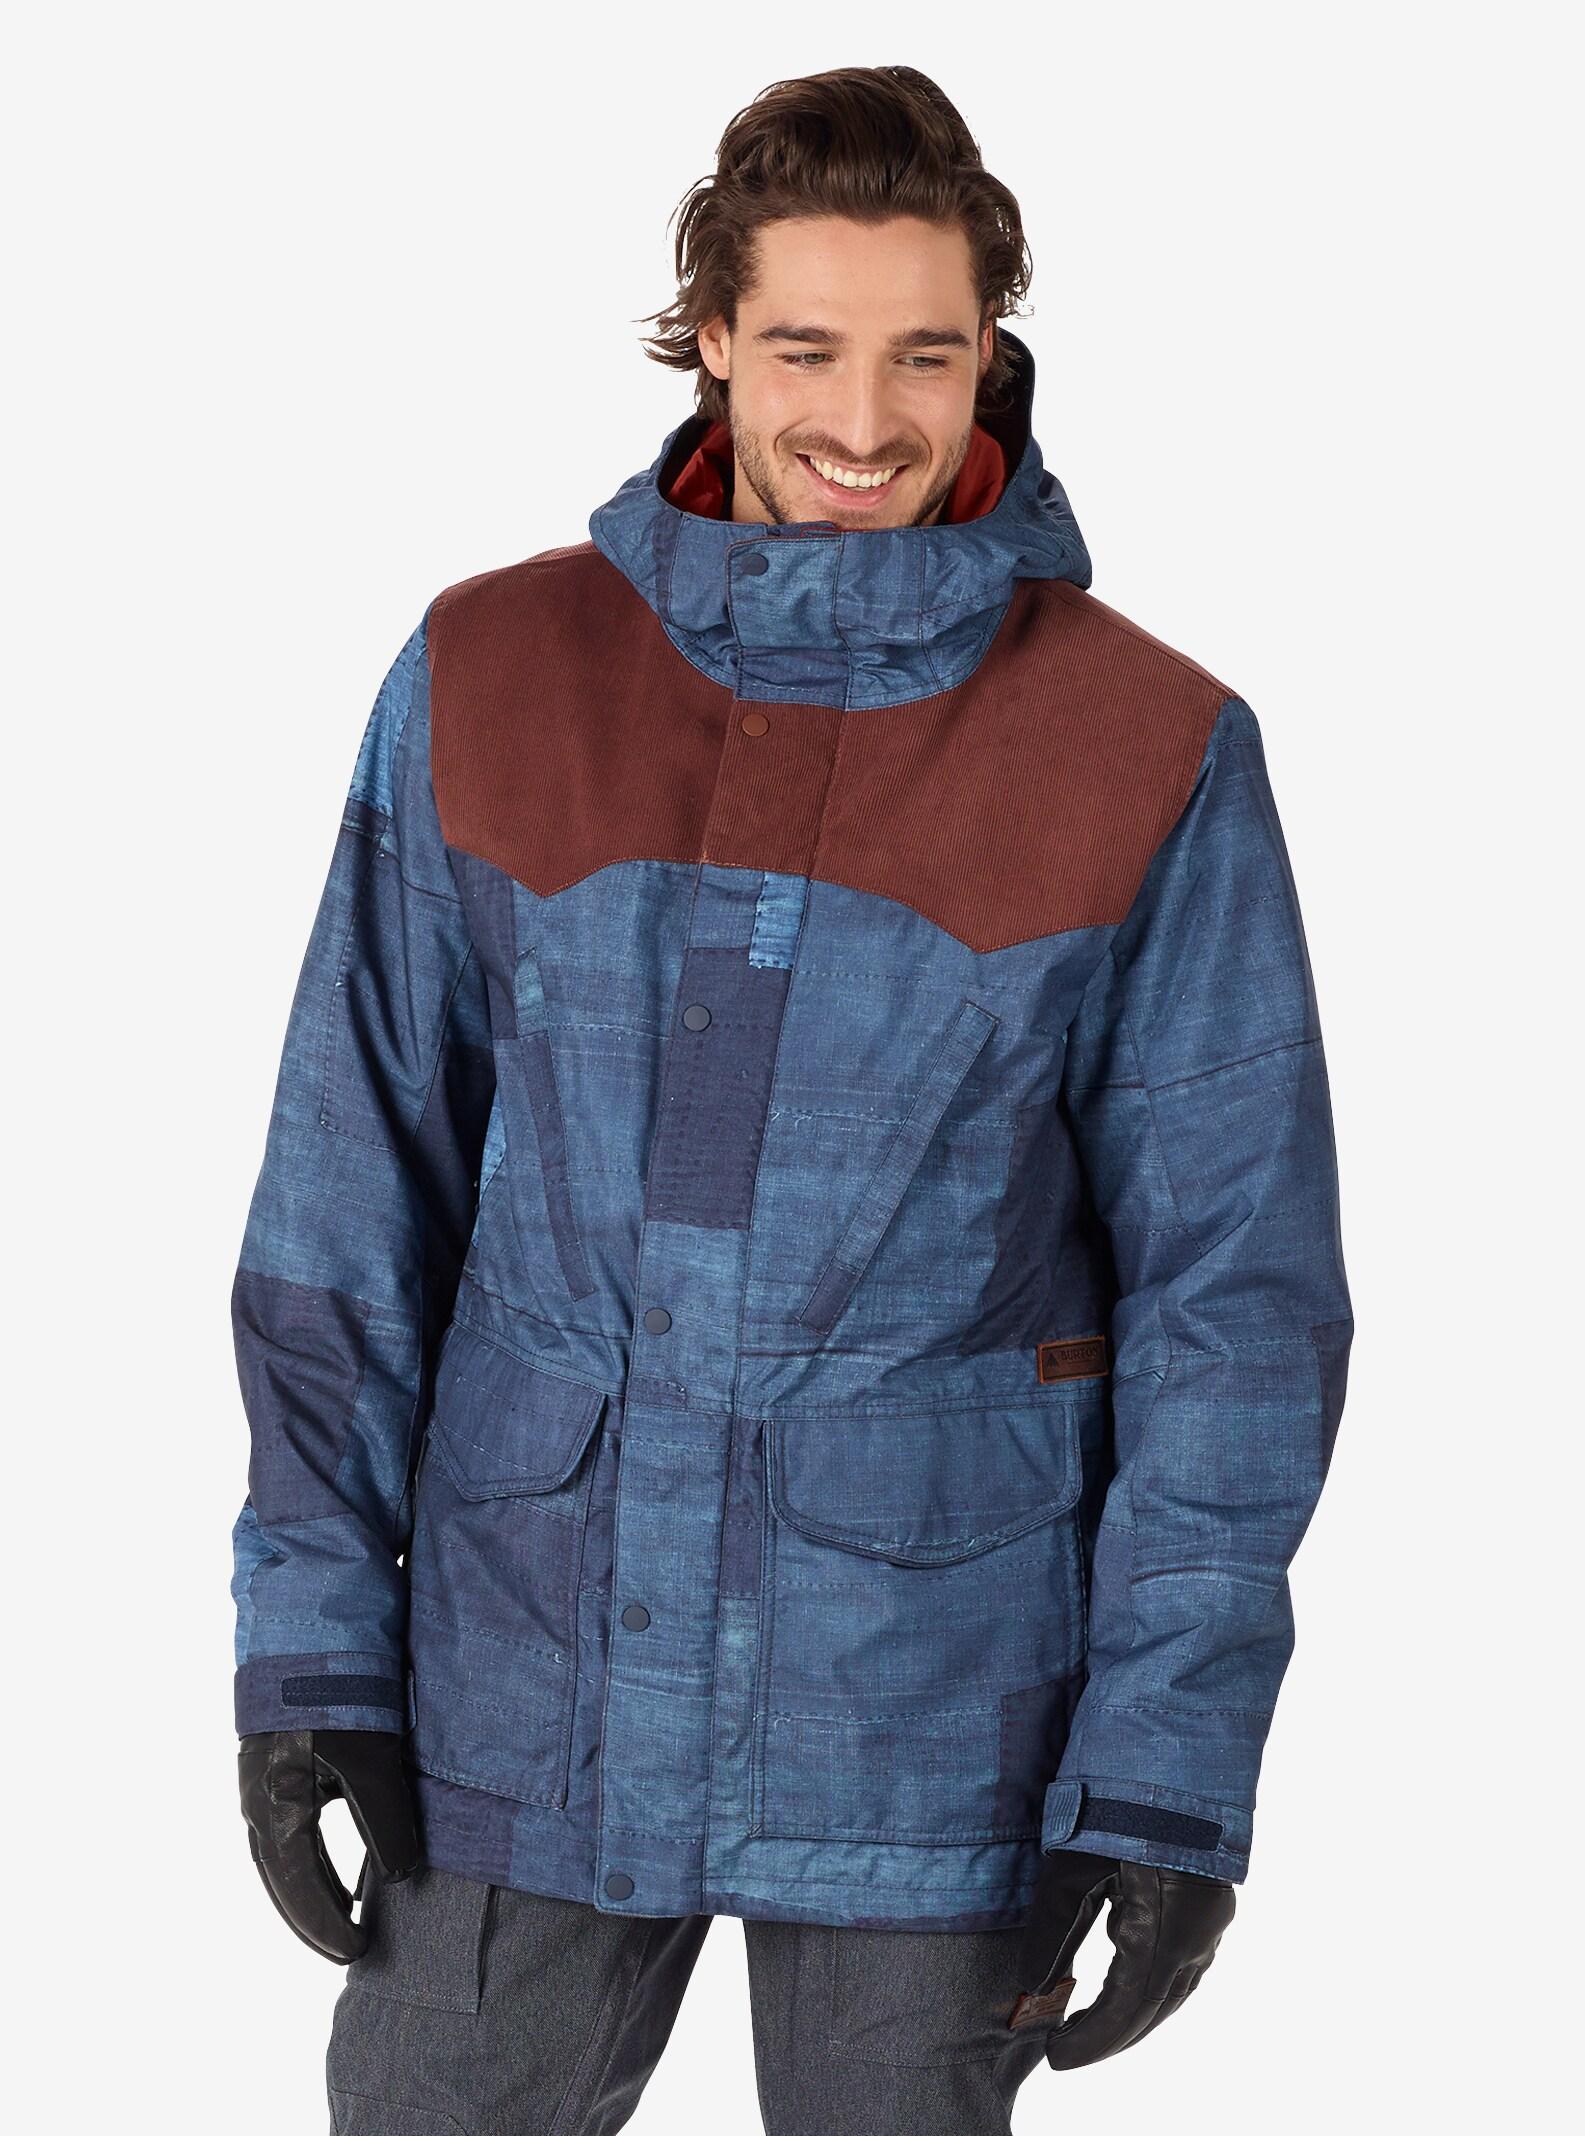 Men's Burton Folsom Jacket shown in Chestnut Cord / Indiohobo